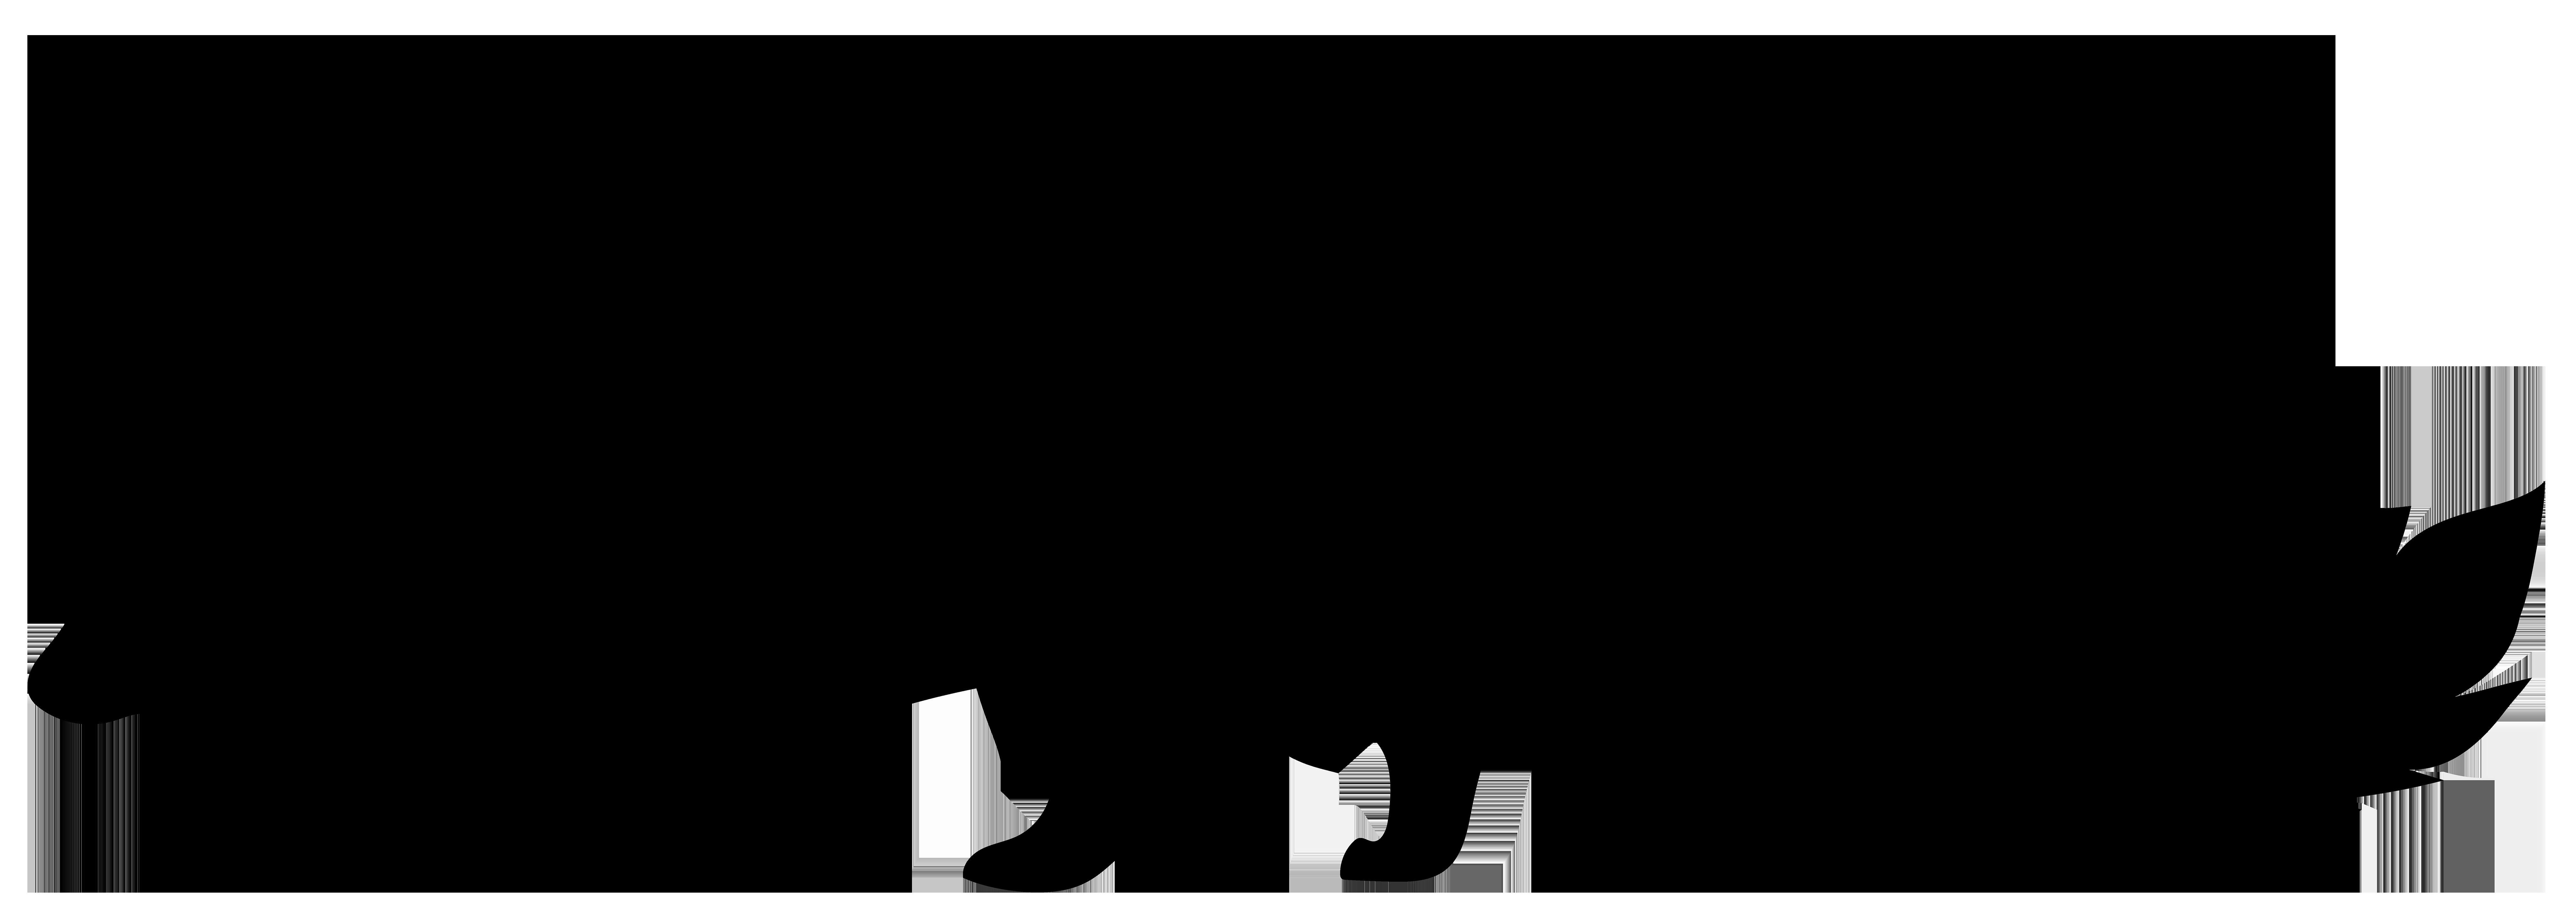 Skunk silhouette clipart vector transparent download Skunk Silhouette PNG Transparent Clip Art Image   Gallery ... vector transparent download